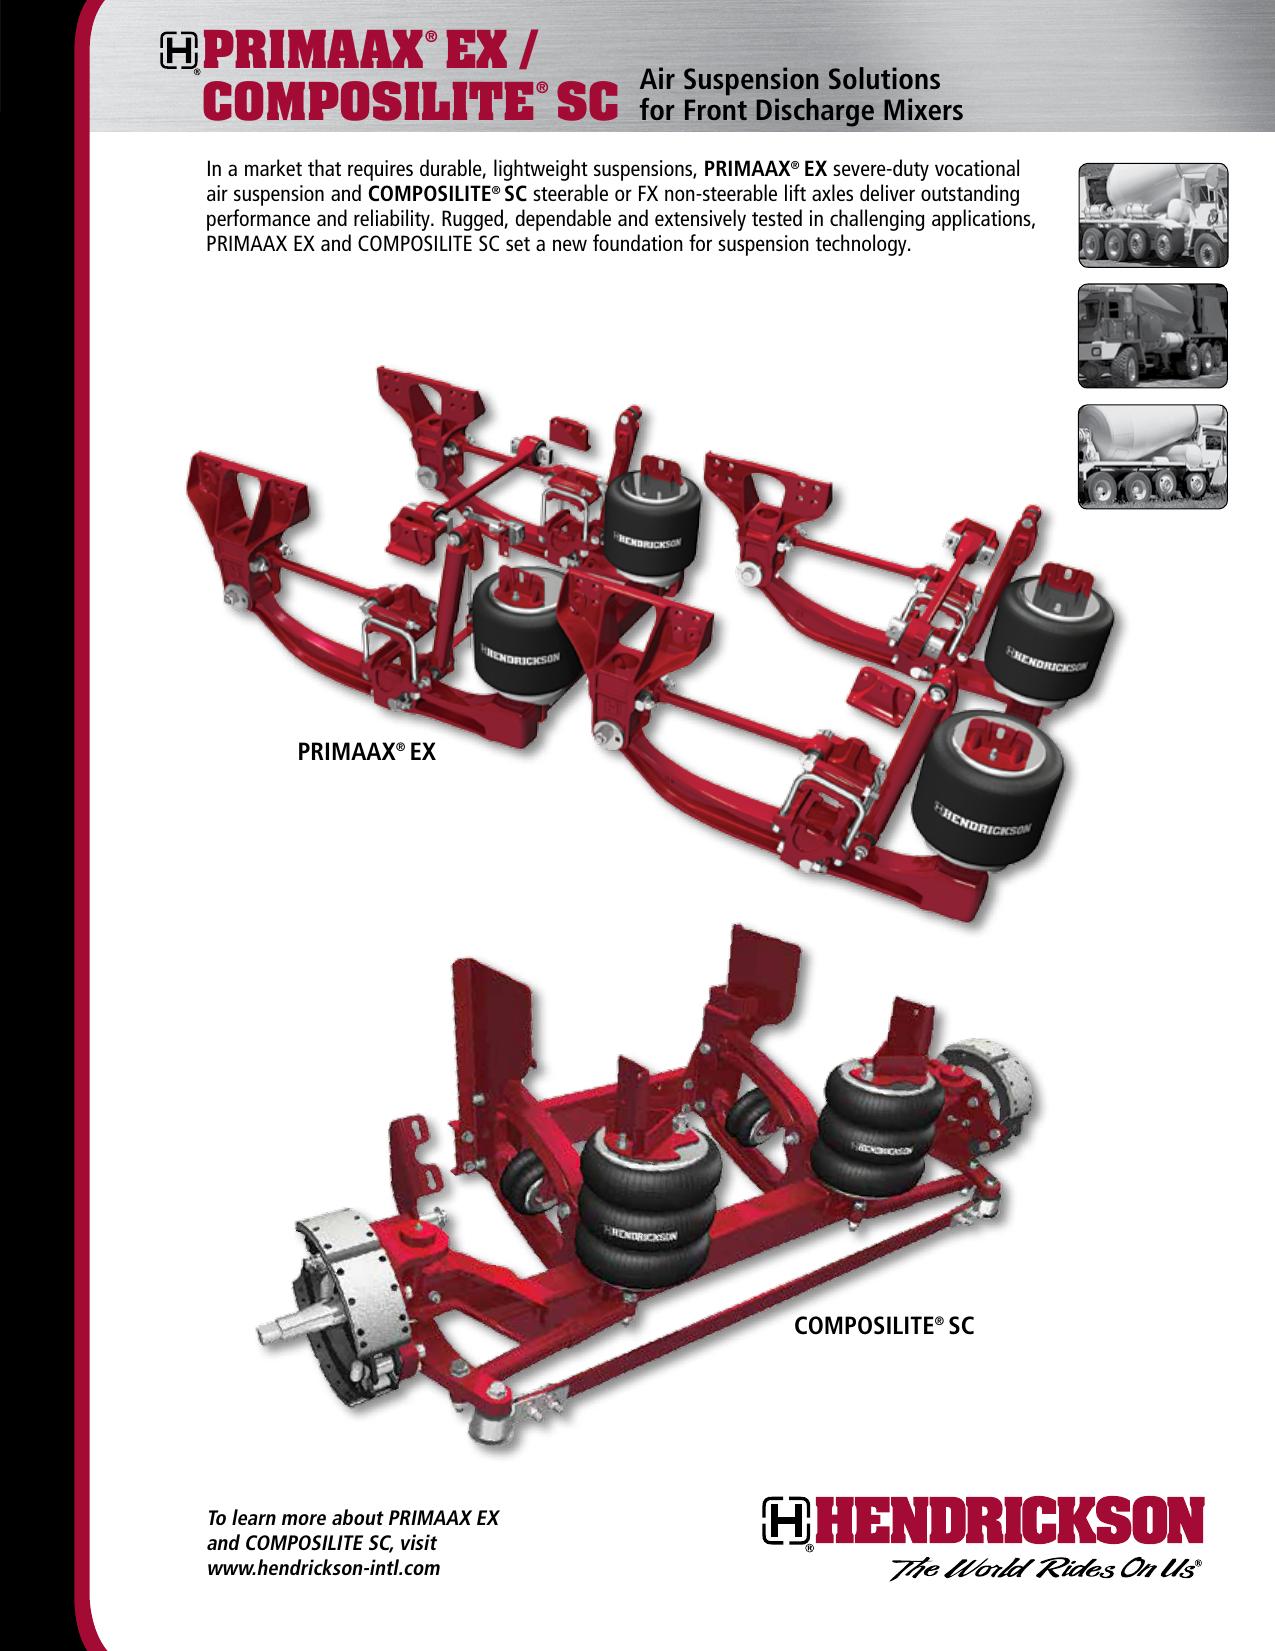 45745-219 PRIMAAX EX / COMPOSILITE SC Brochure   manualzz com